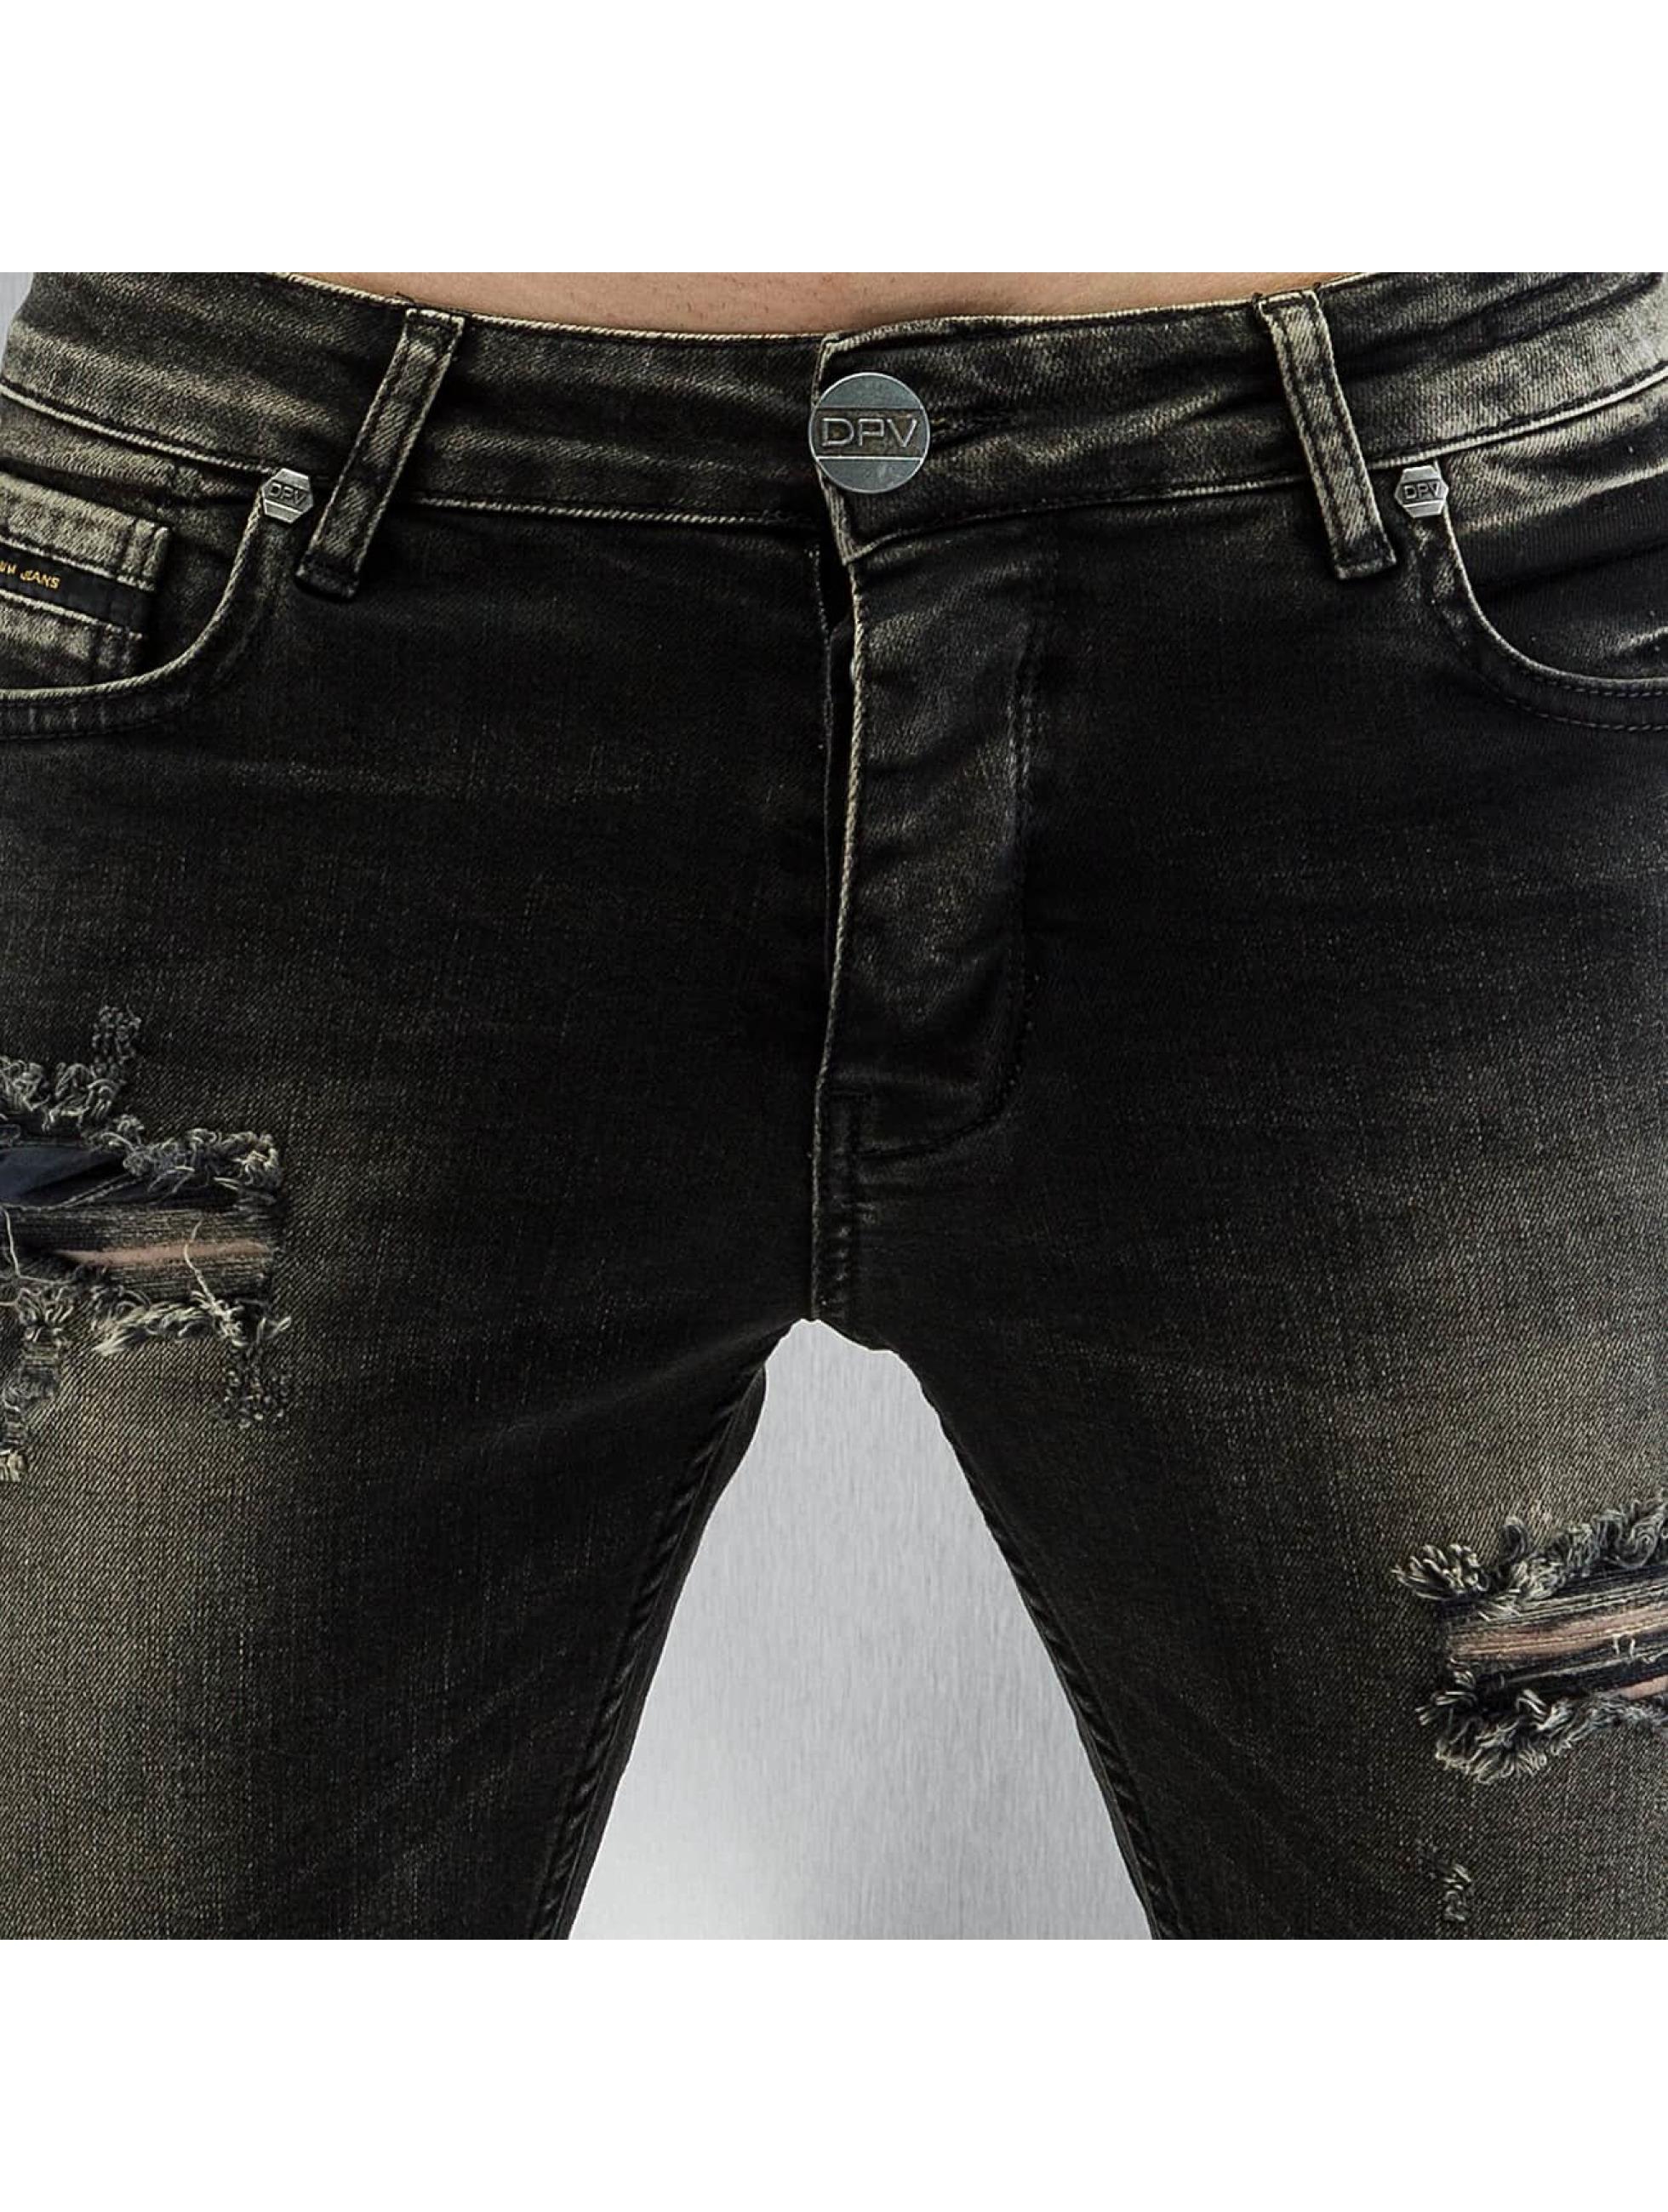 2Y Skinny Jeans Cascais black